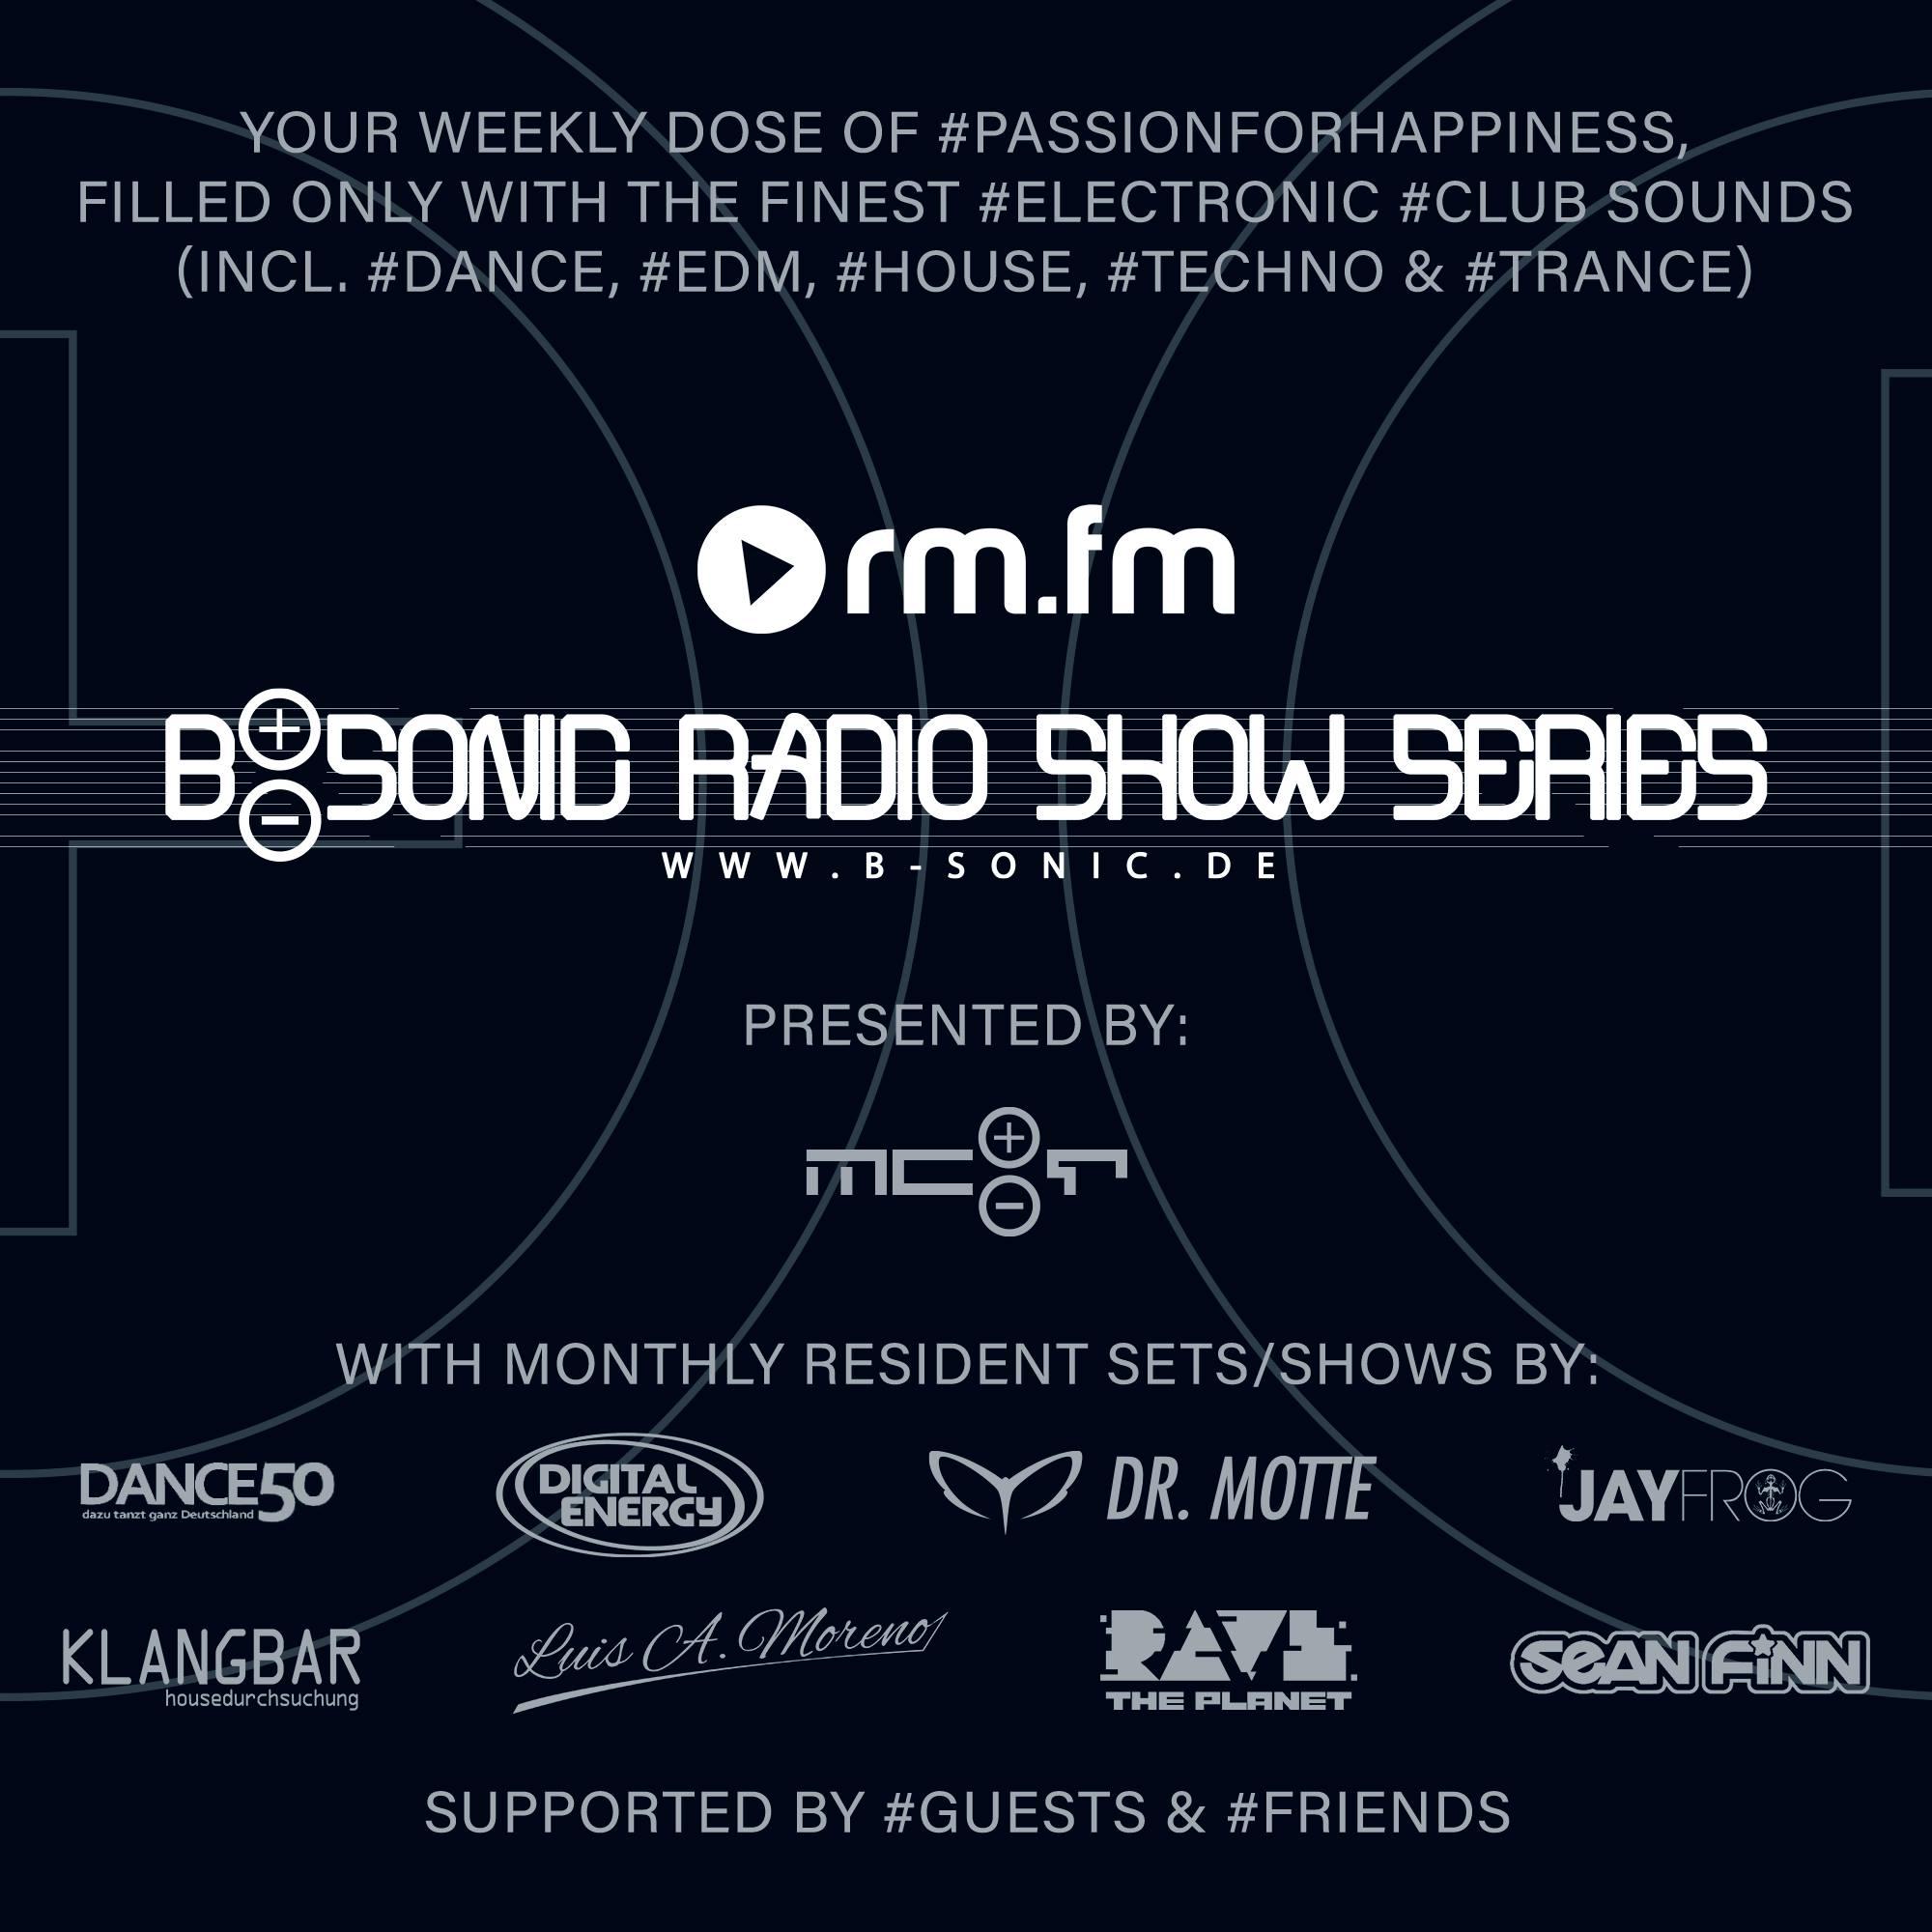 B-Sonic Music kündigt die 'B-Sonic Radio Show Series' an